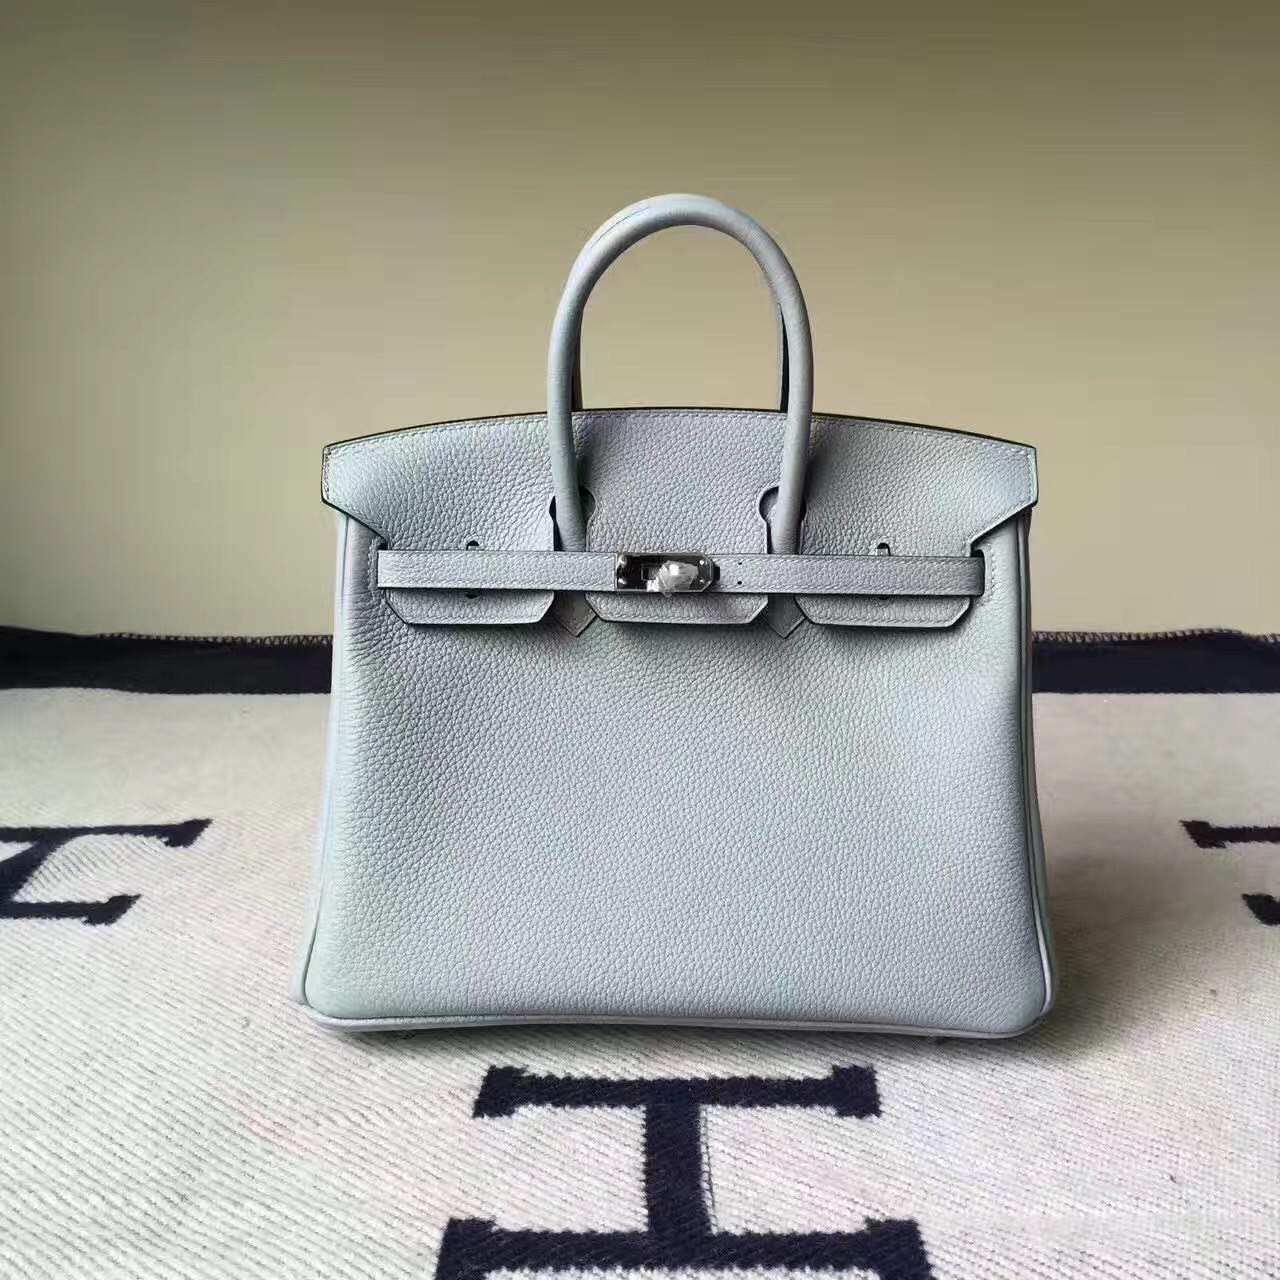 Discount Hermes 8U Glacial Blue Togo Calfskin Leather Birkin Bag 25cm